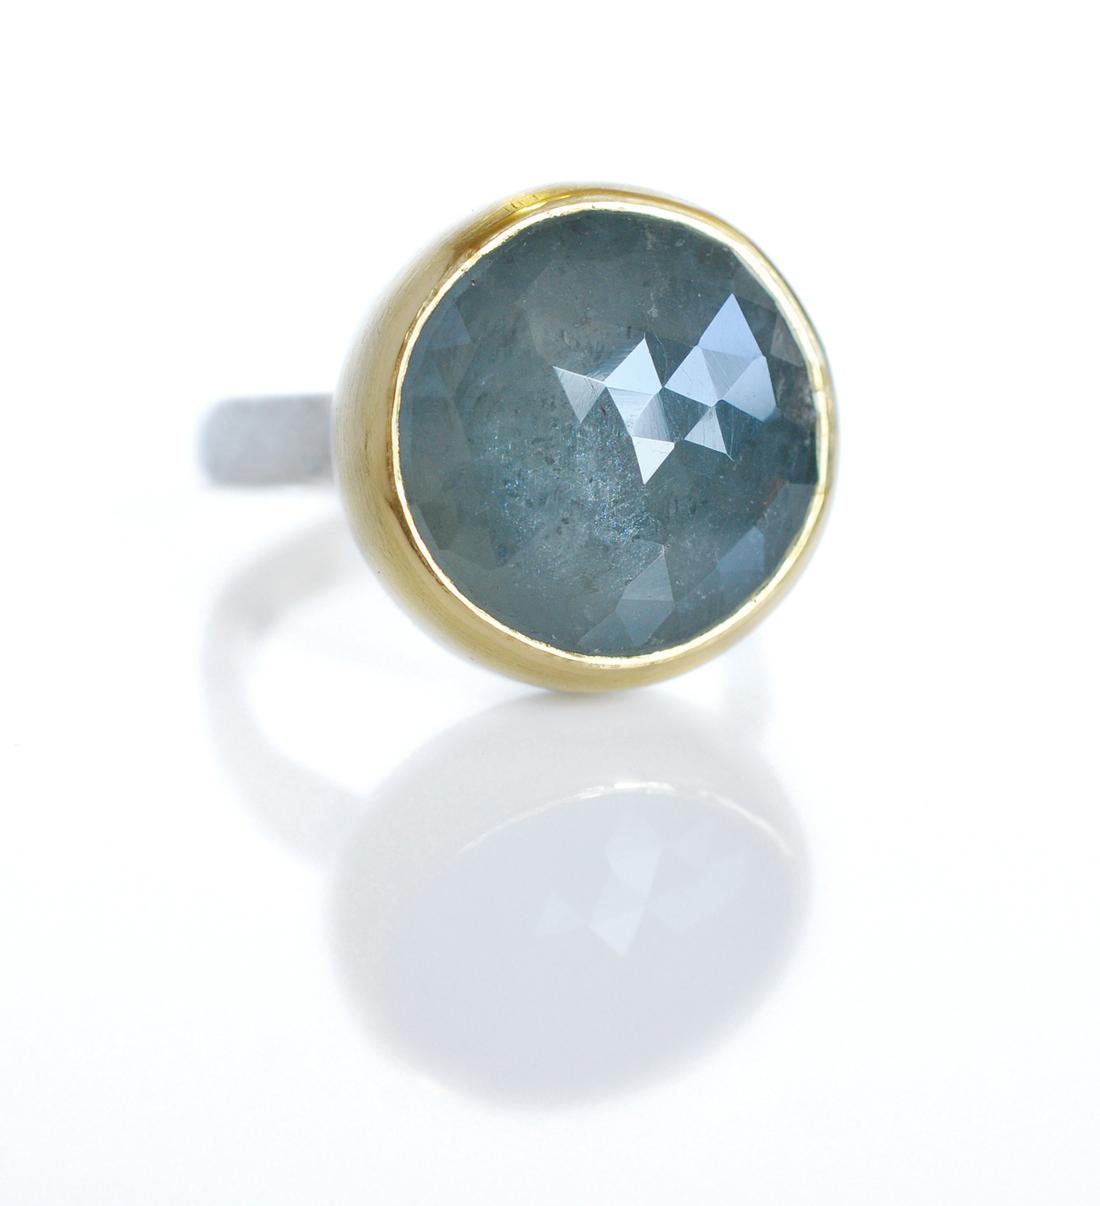 KellyV-seafoam-green-cocktail-ring-rosecut-sapphire-18ky-bezel-hammered-silver-band-side2.jpg